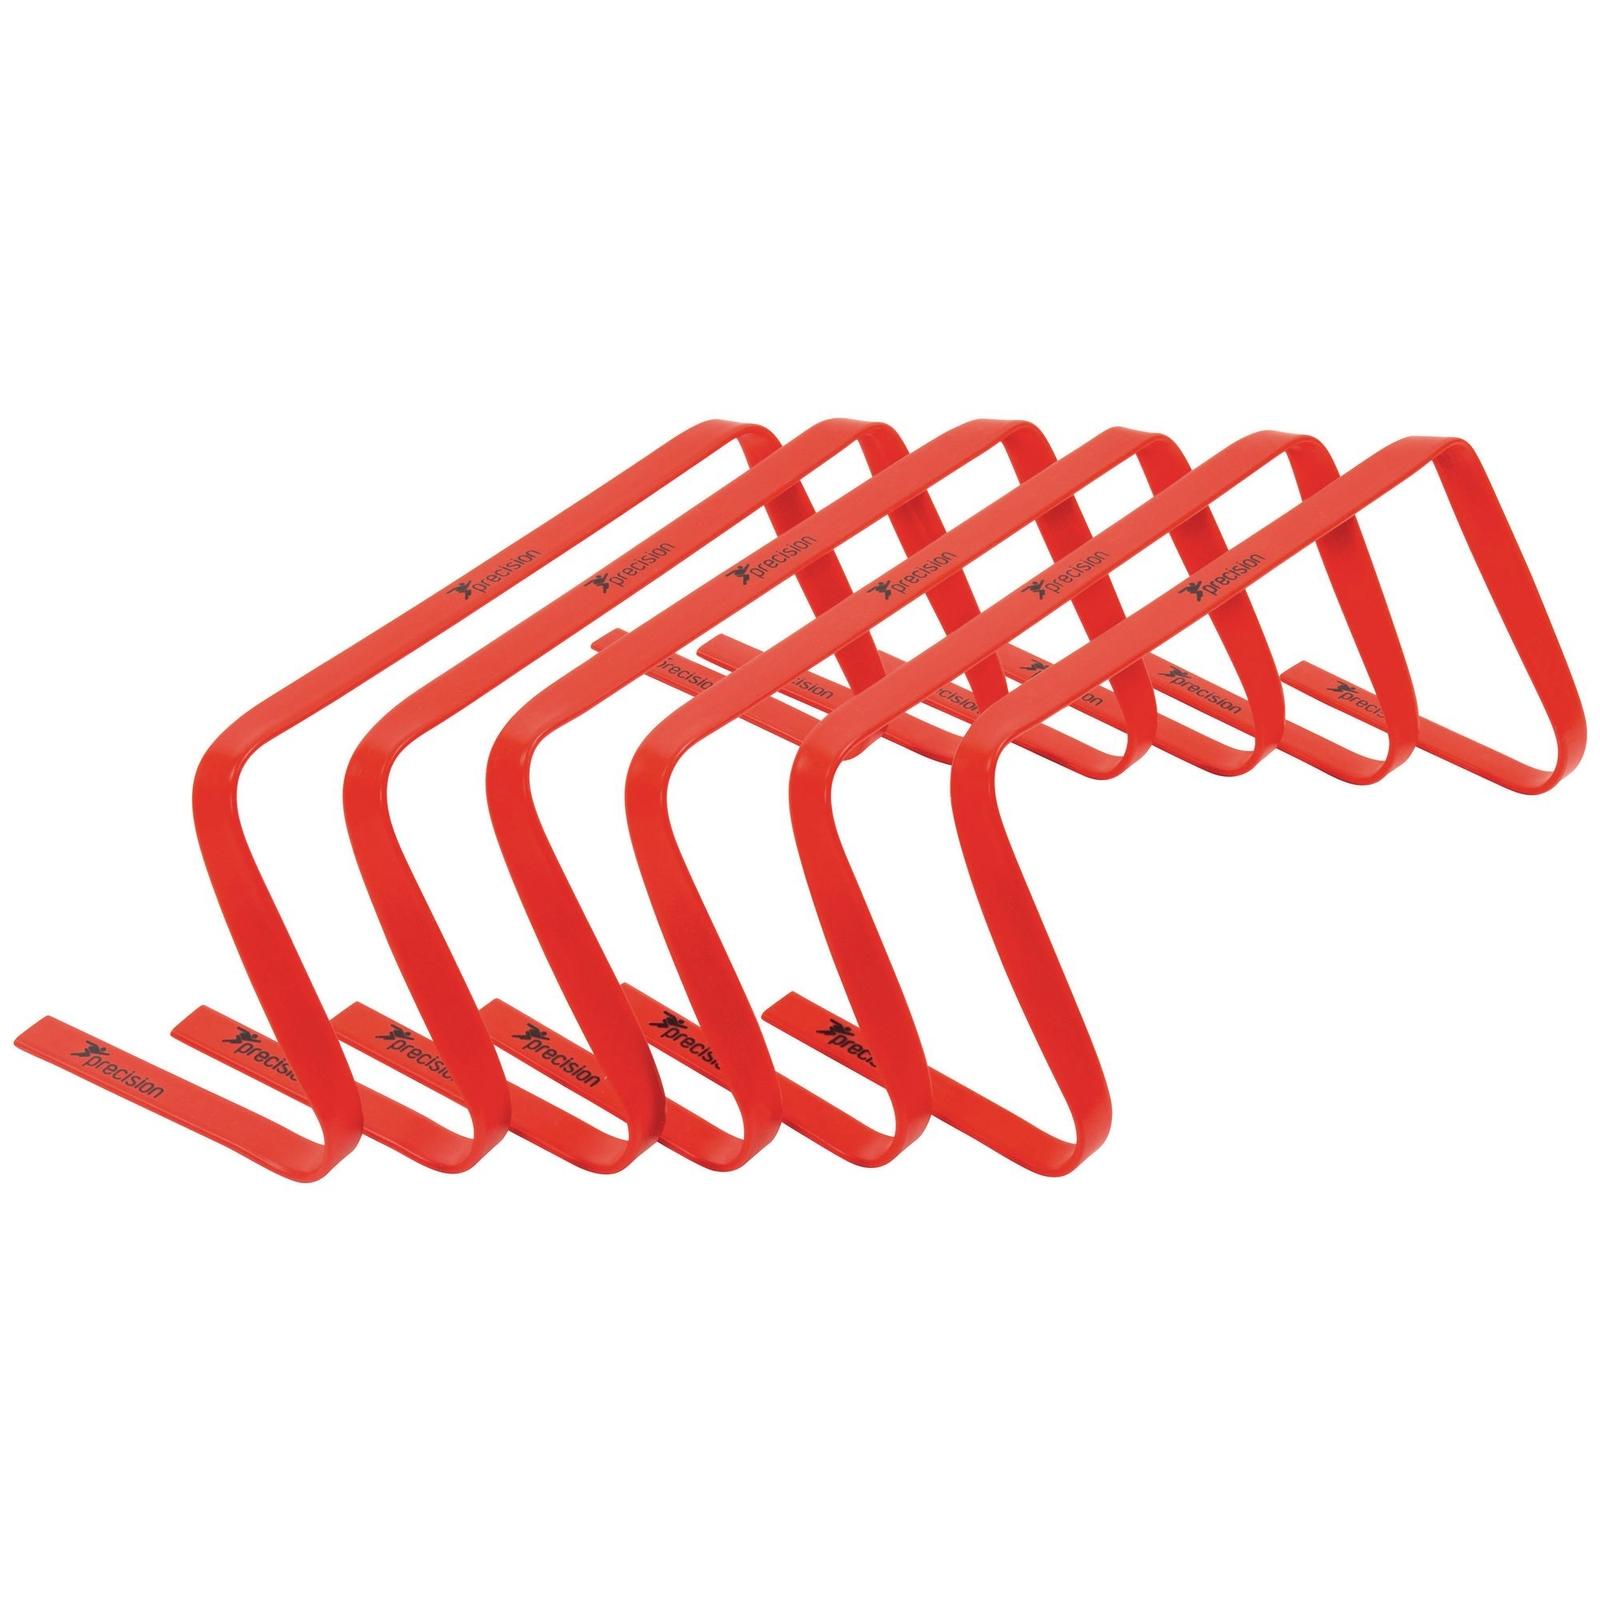 Precision Flat Hurdles - 9in - Red